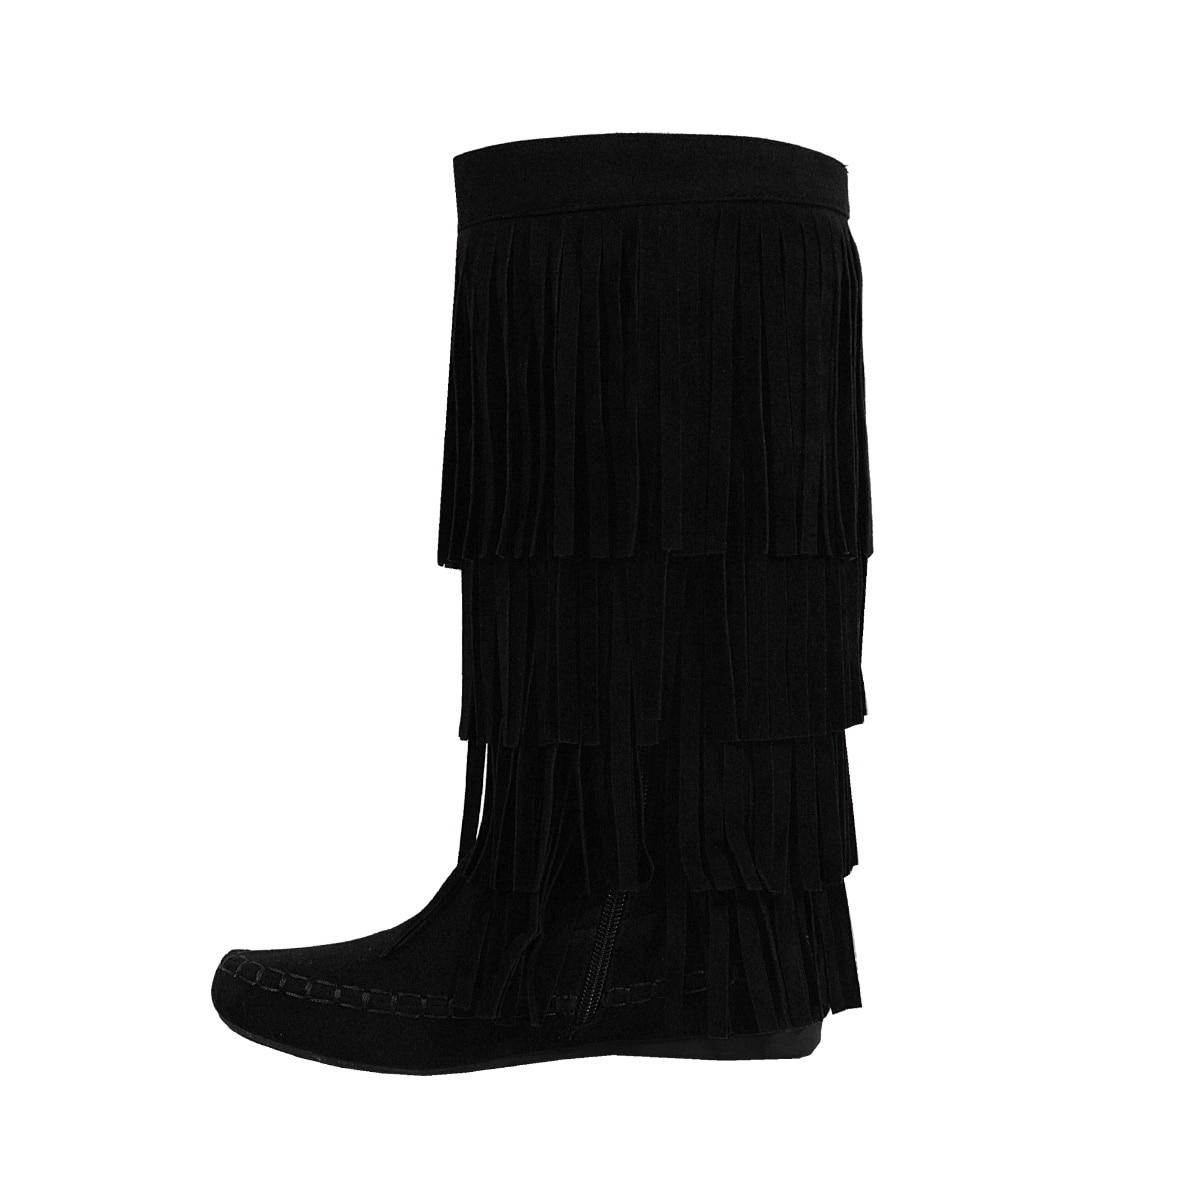 Yoki Mudd-55 Womens 4 Layer Fringe Flat Boots Moccasin Mid Calf Comfy Boots